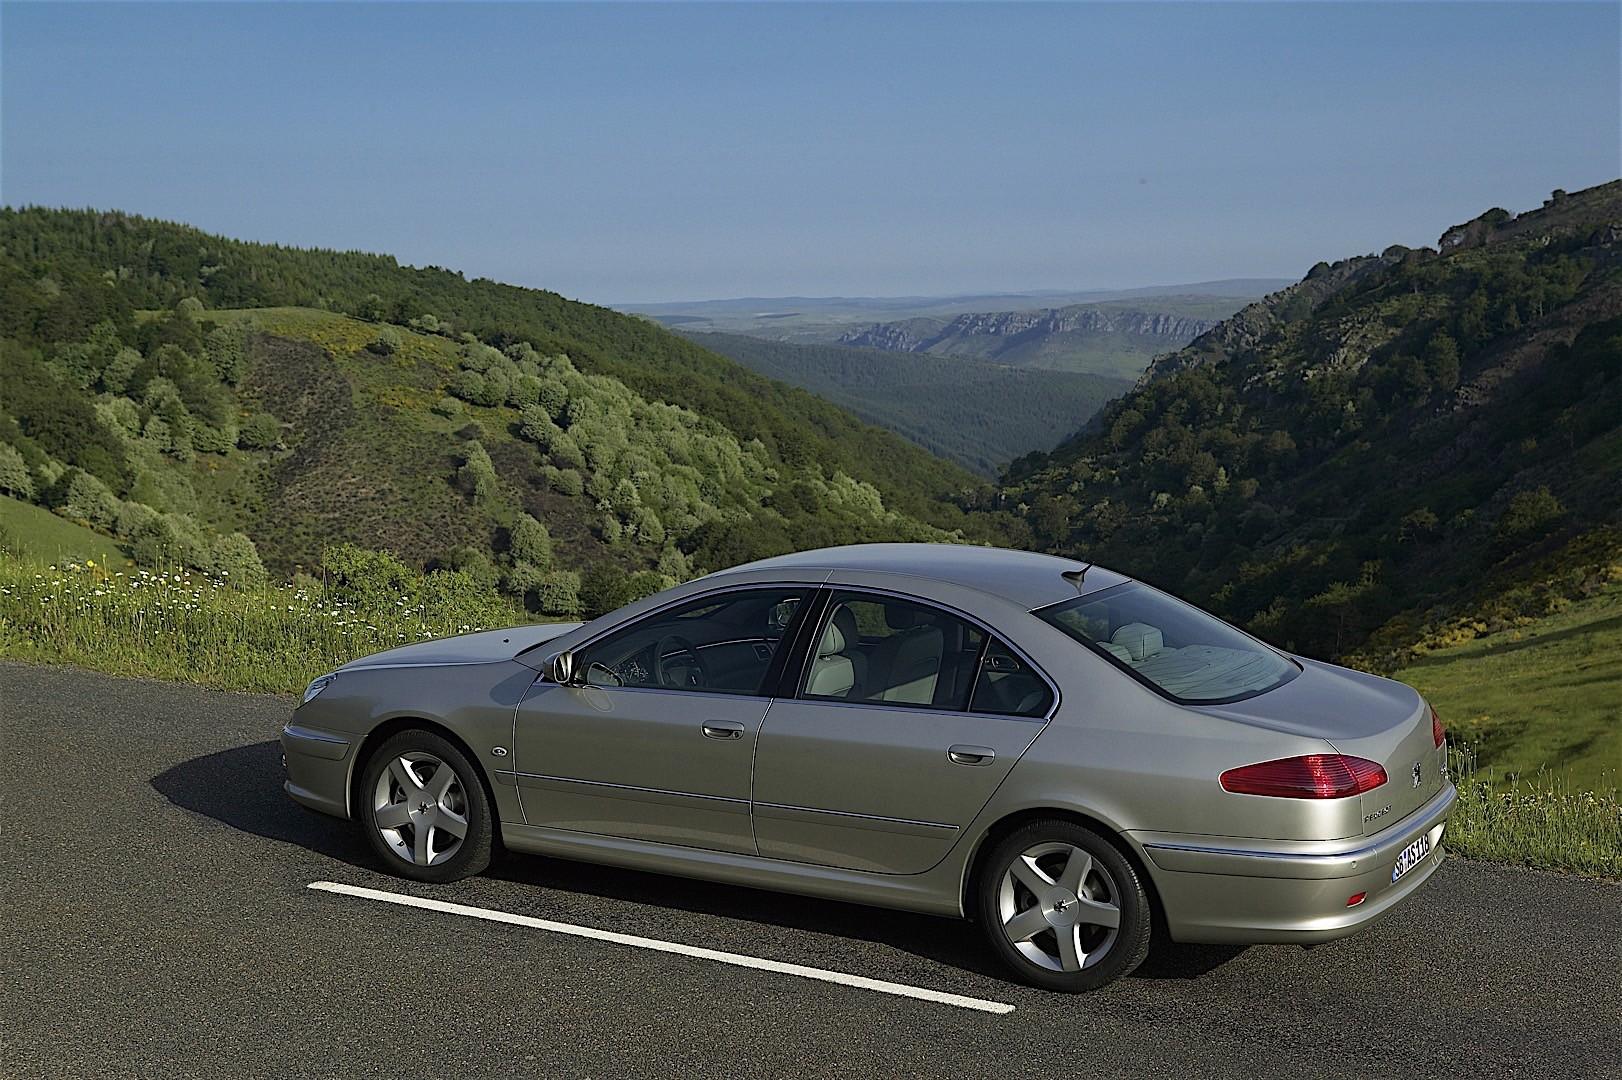 peugeot 607 specs - 2005, 2006, 2007, 2008, 2009, 2010 - autoevolution